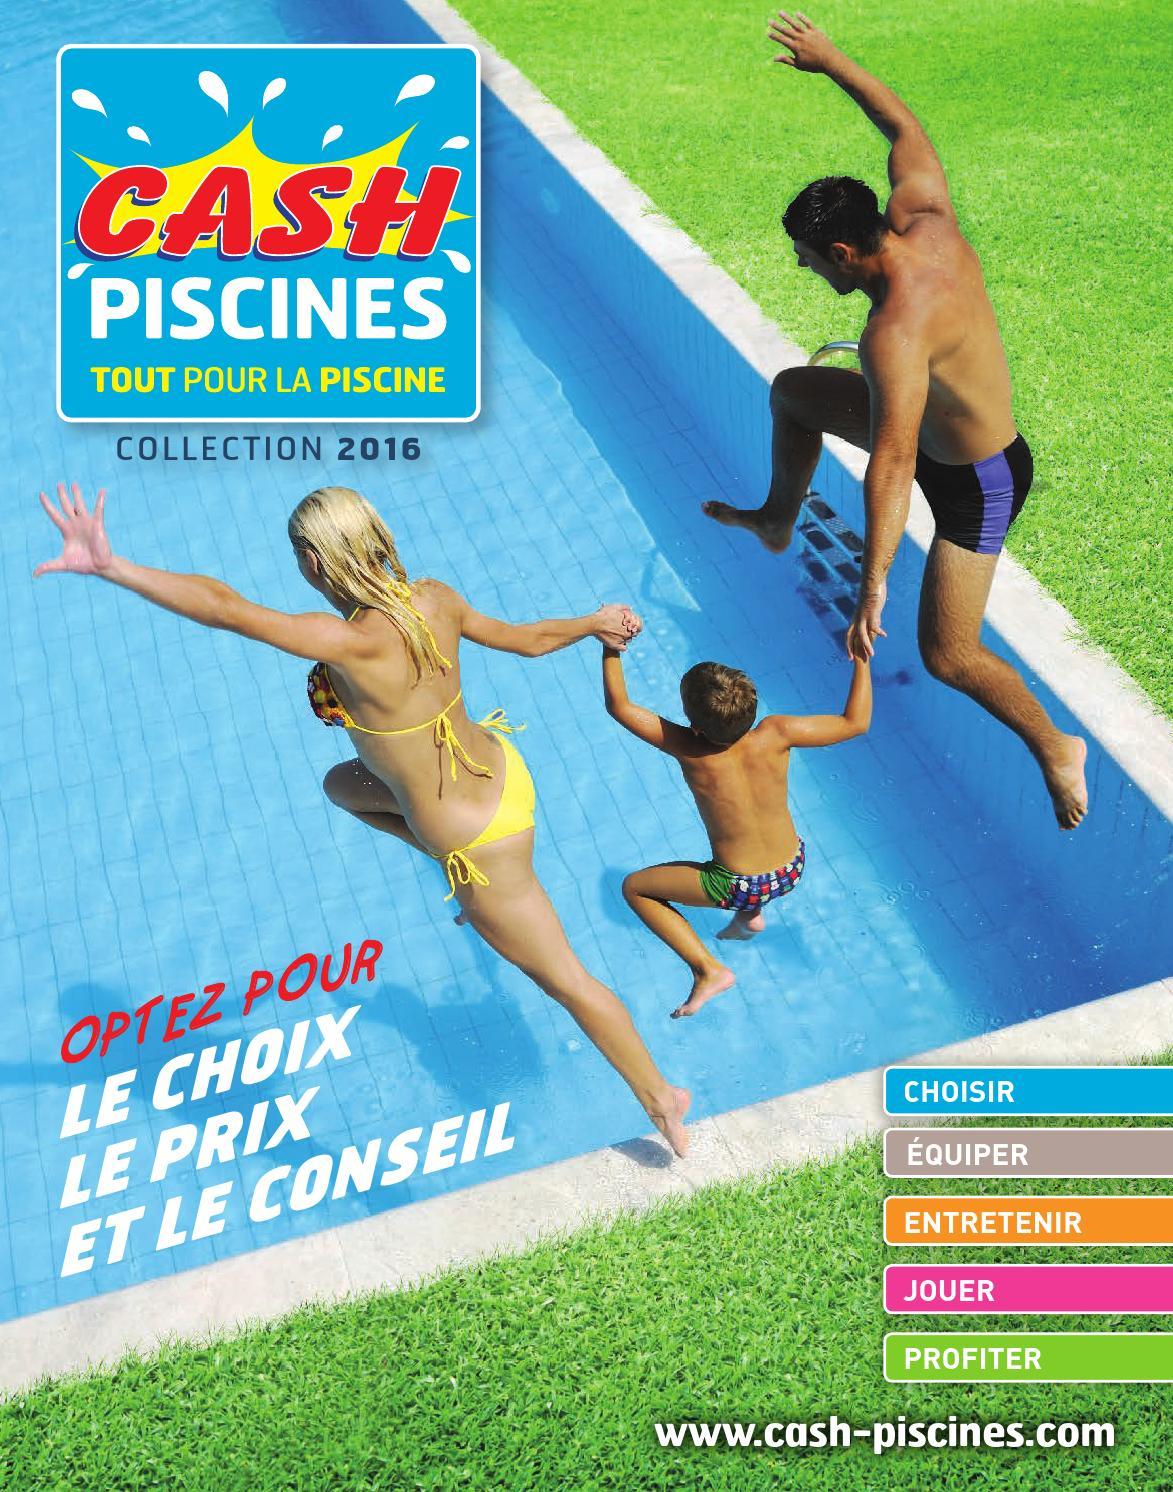 Cash Piscines 2016 By Octave Octave - Issuu dedans Cash Piscine Montauban